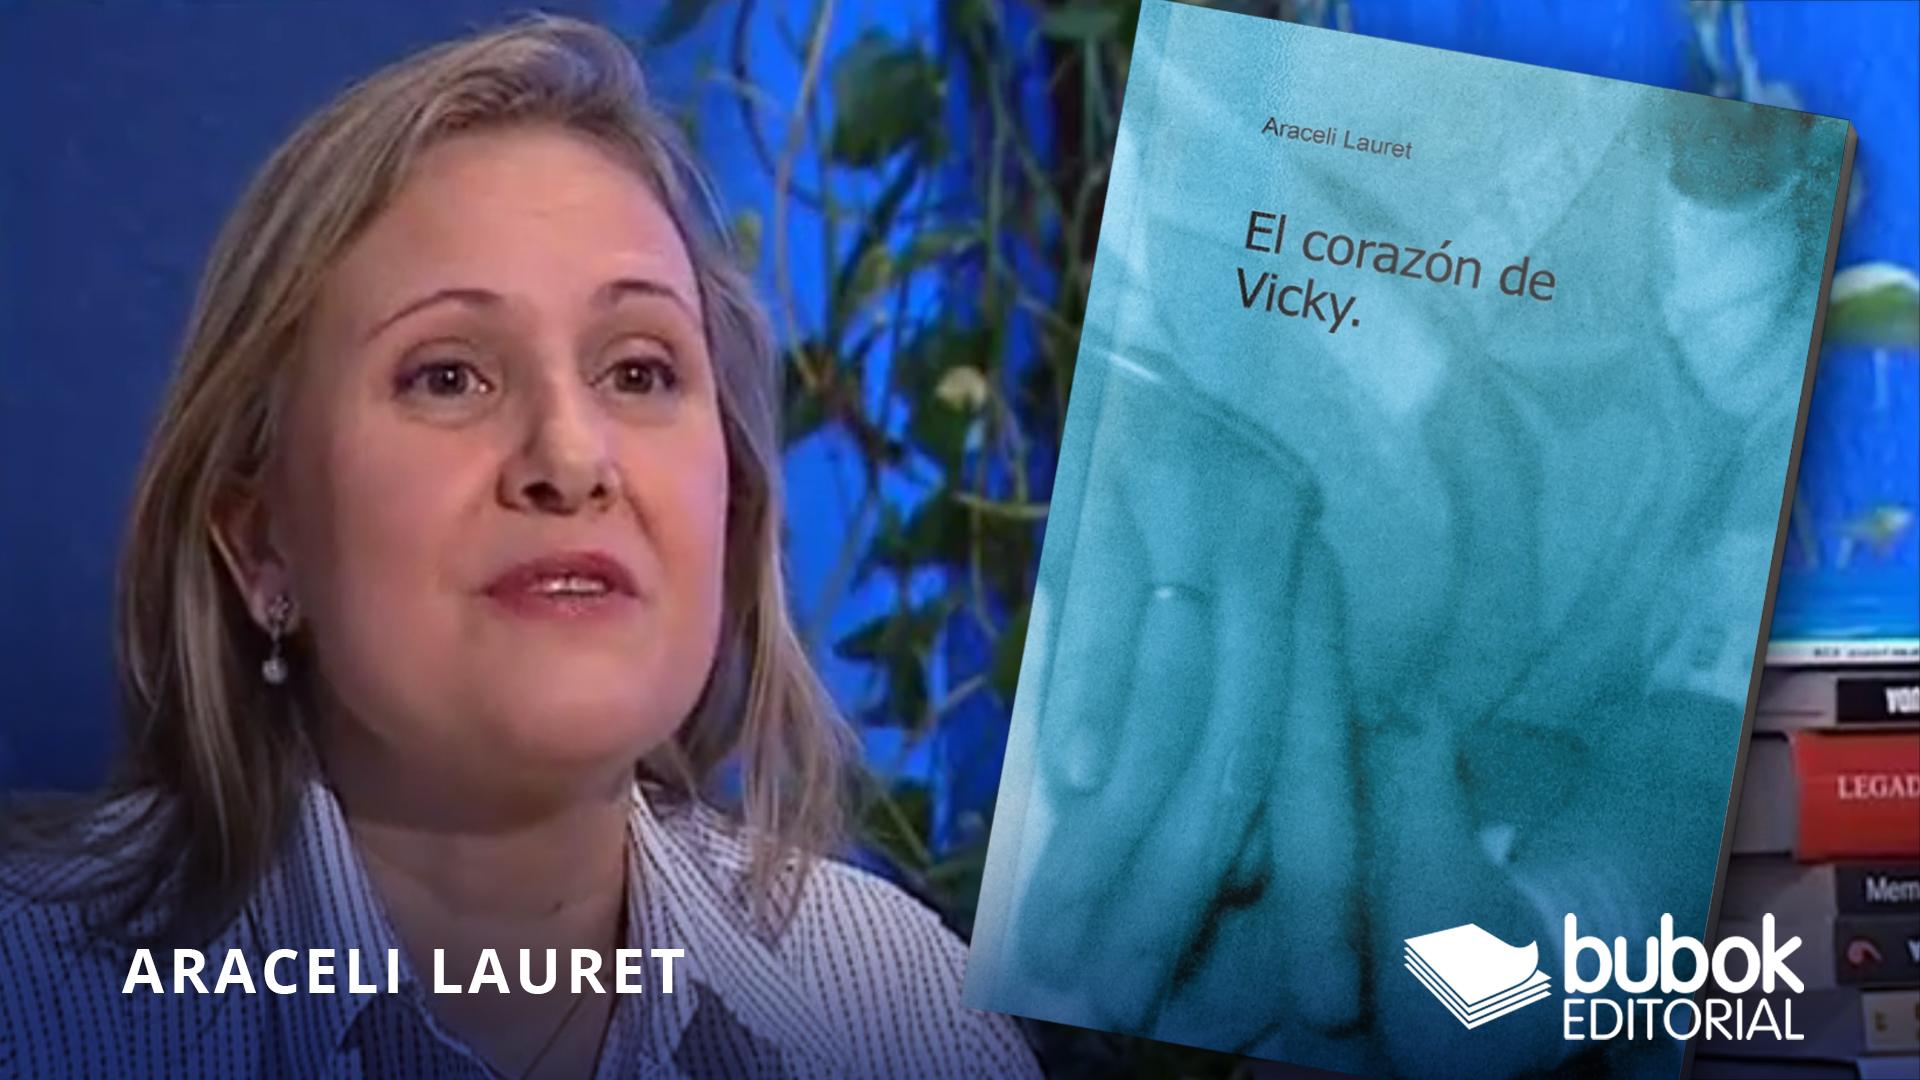 Entrevista a Araceli Lauret sobre EL CORAZON DE VICKY